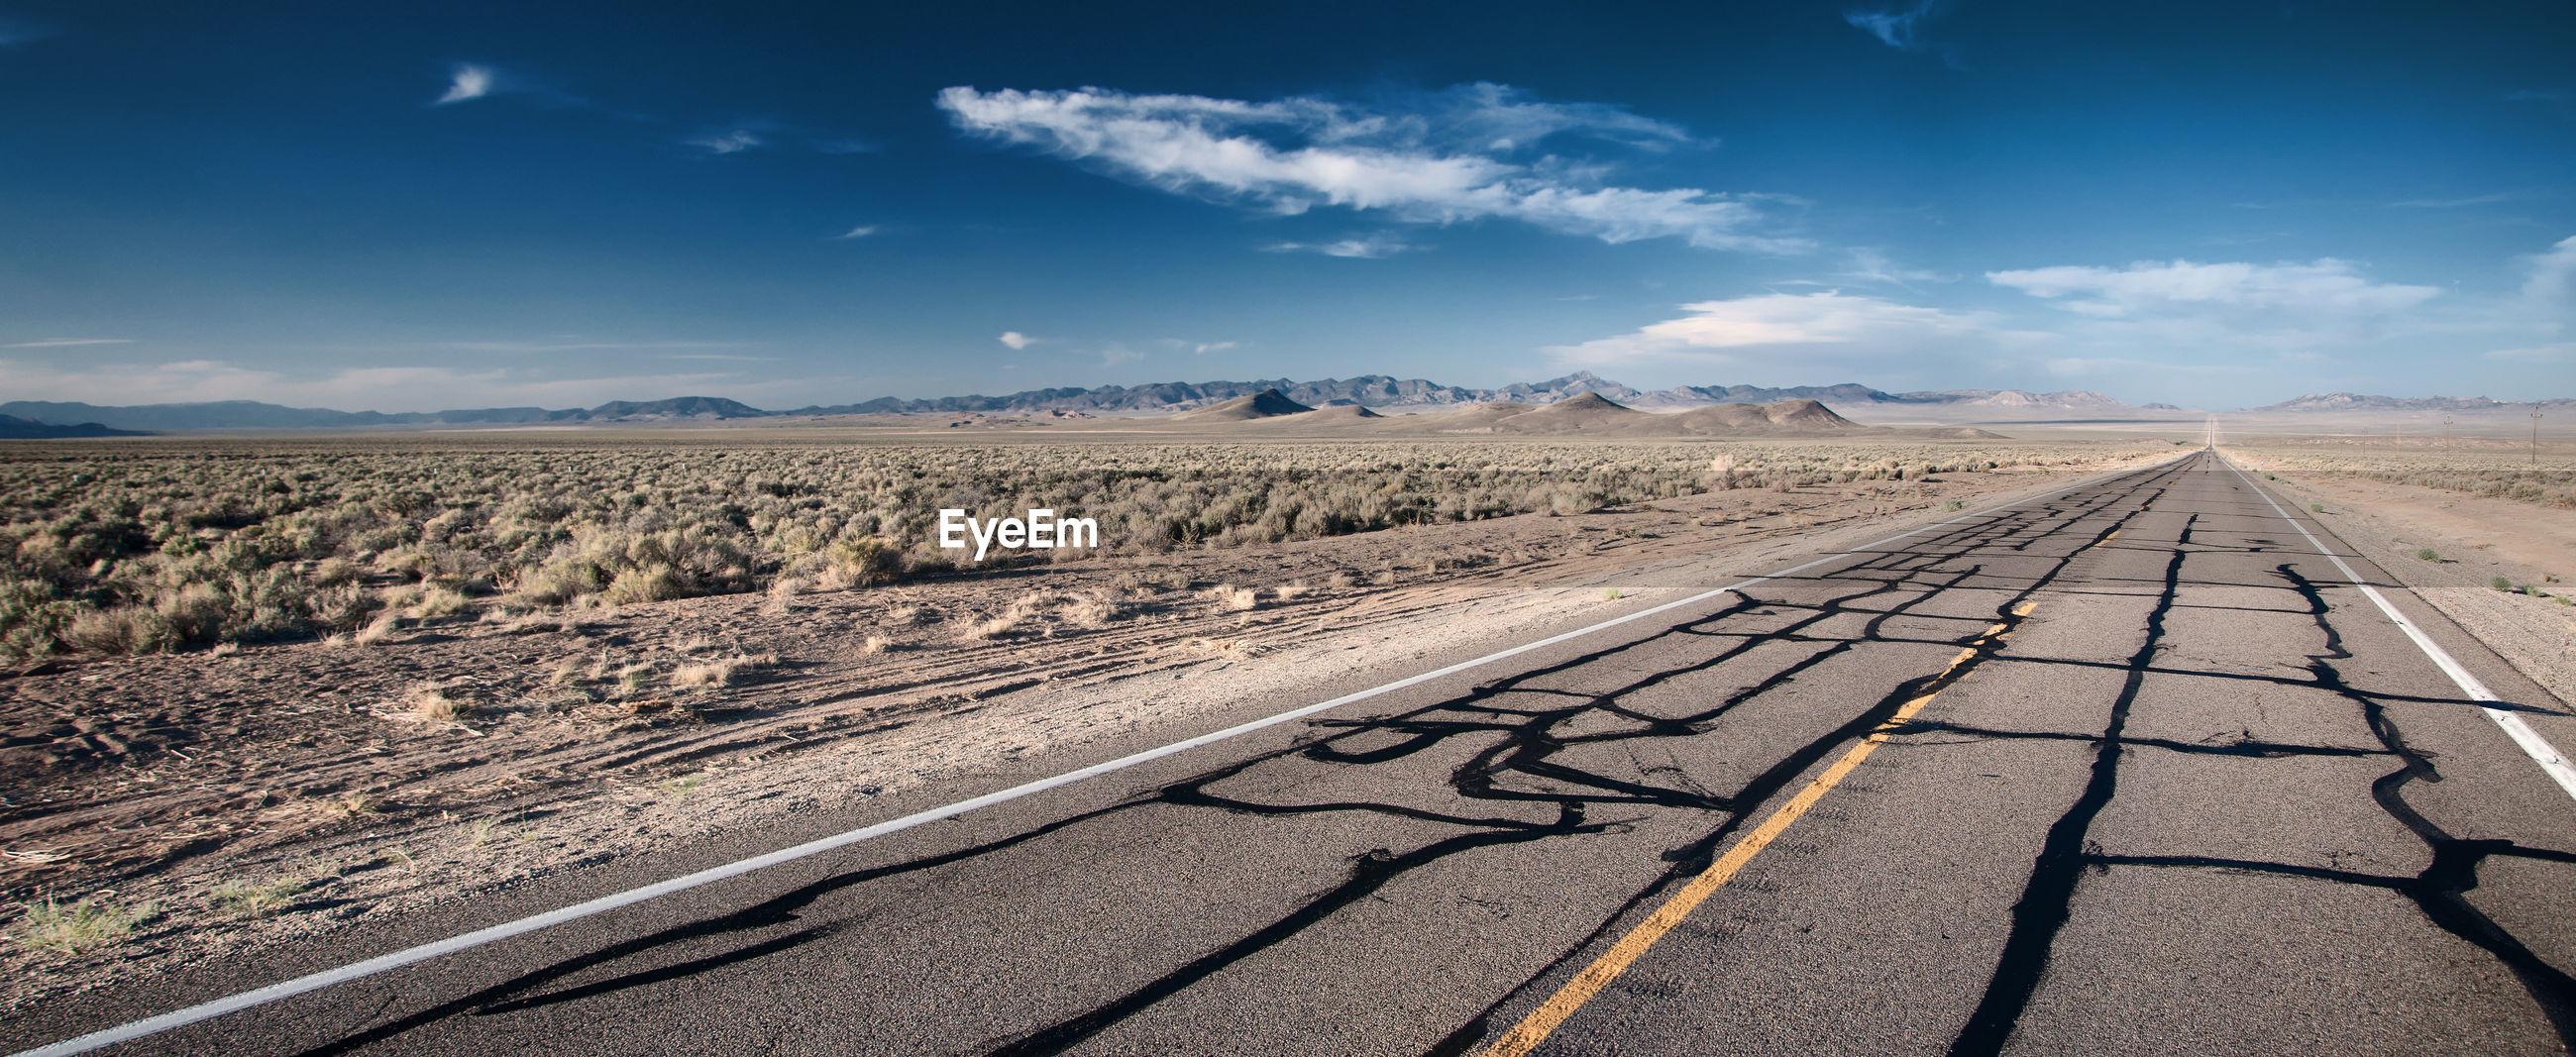 Tire tracks on landscape against sky